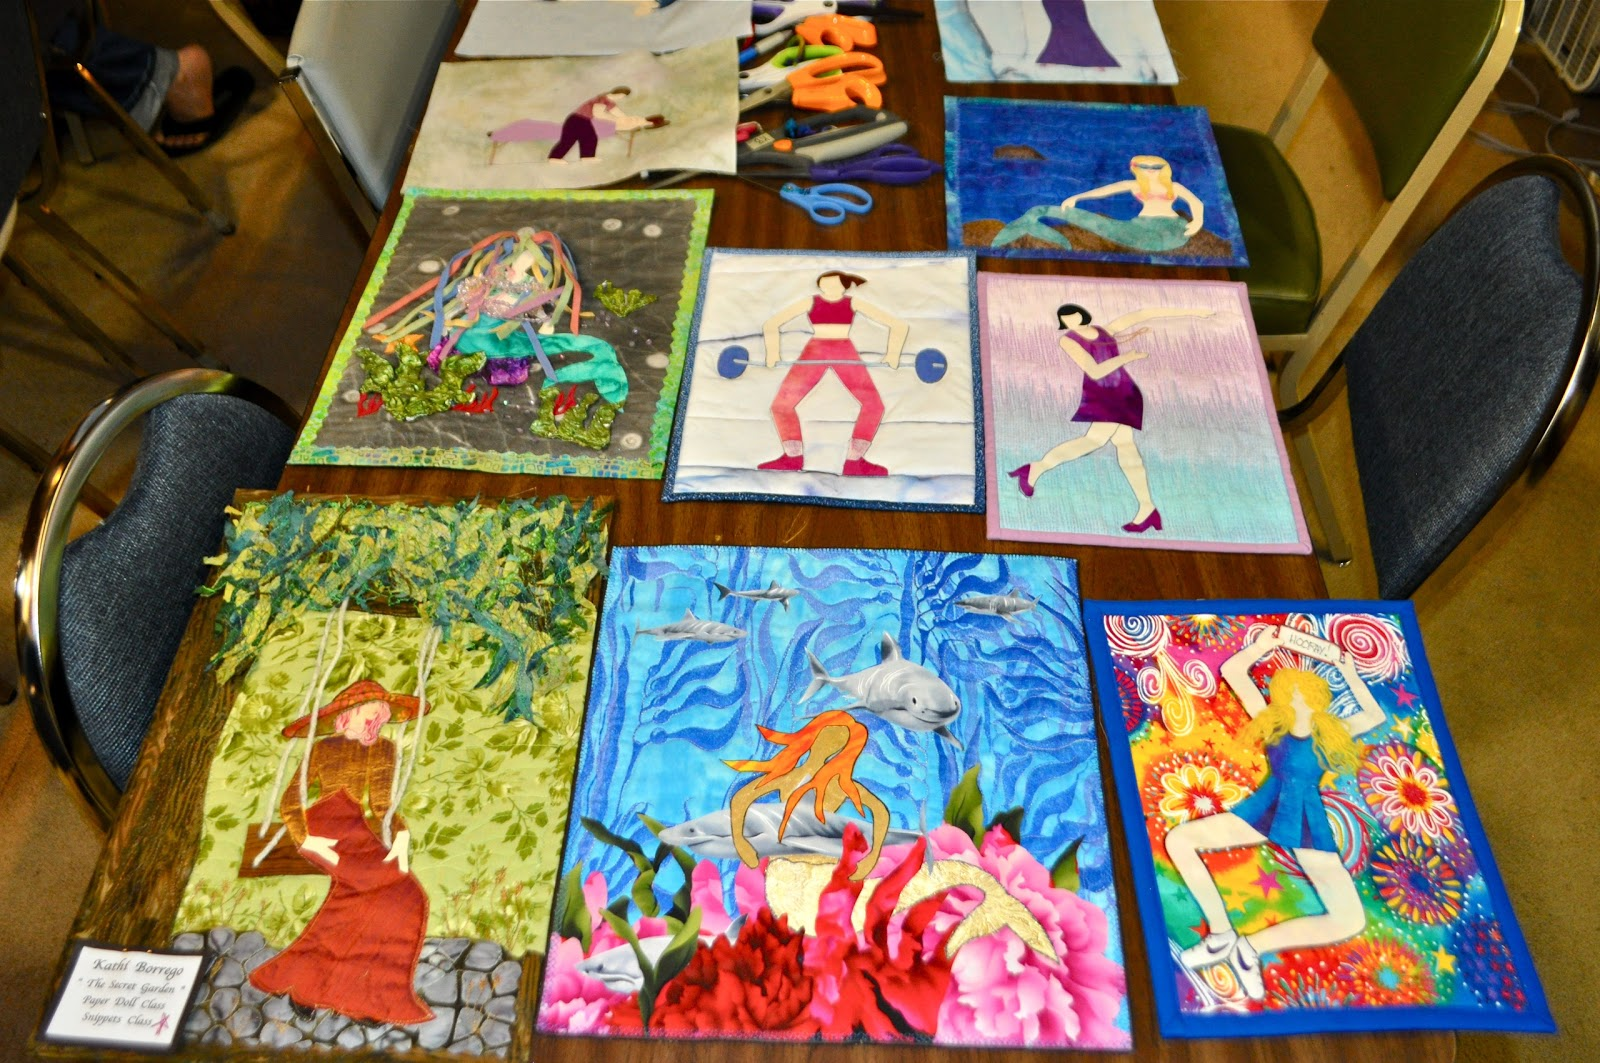 http://4.bp.blogspot.com/-6ns_oSGtNrc/UBWMpcjAn2I/AAAAAAAAPOg/GZrVTn1hTwg/s1600/Paper+Dolls+23.jpg